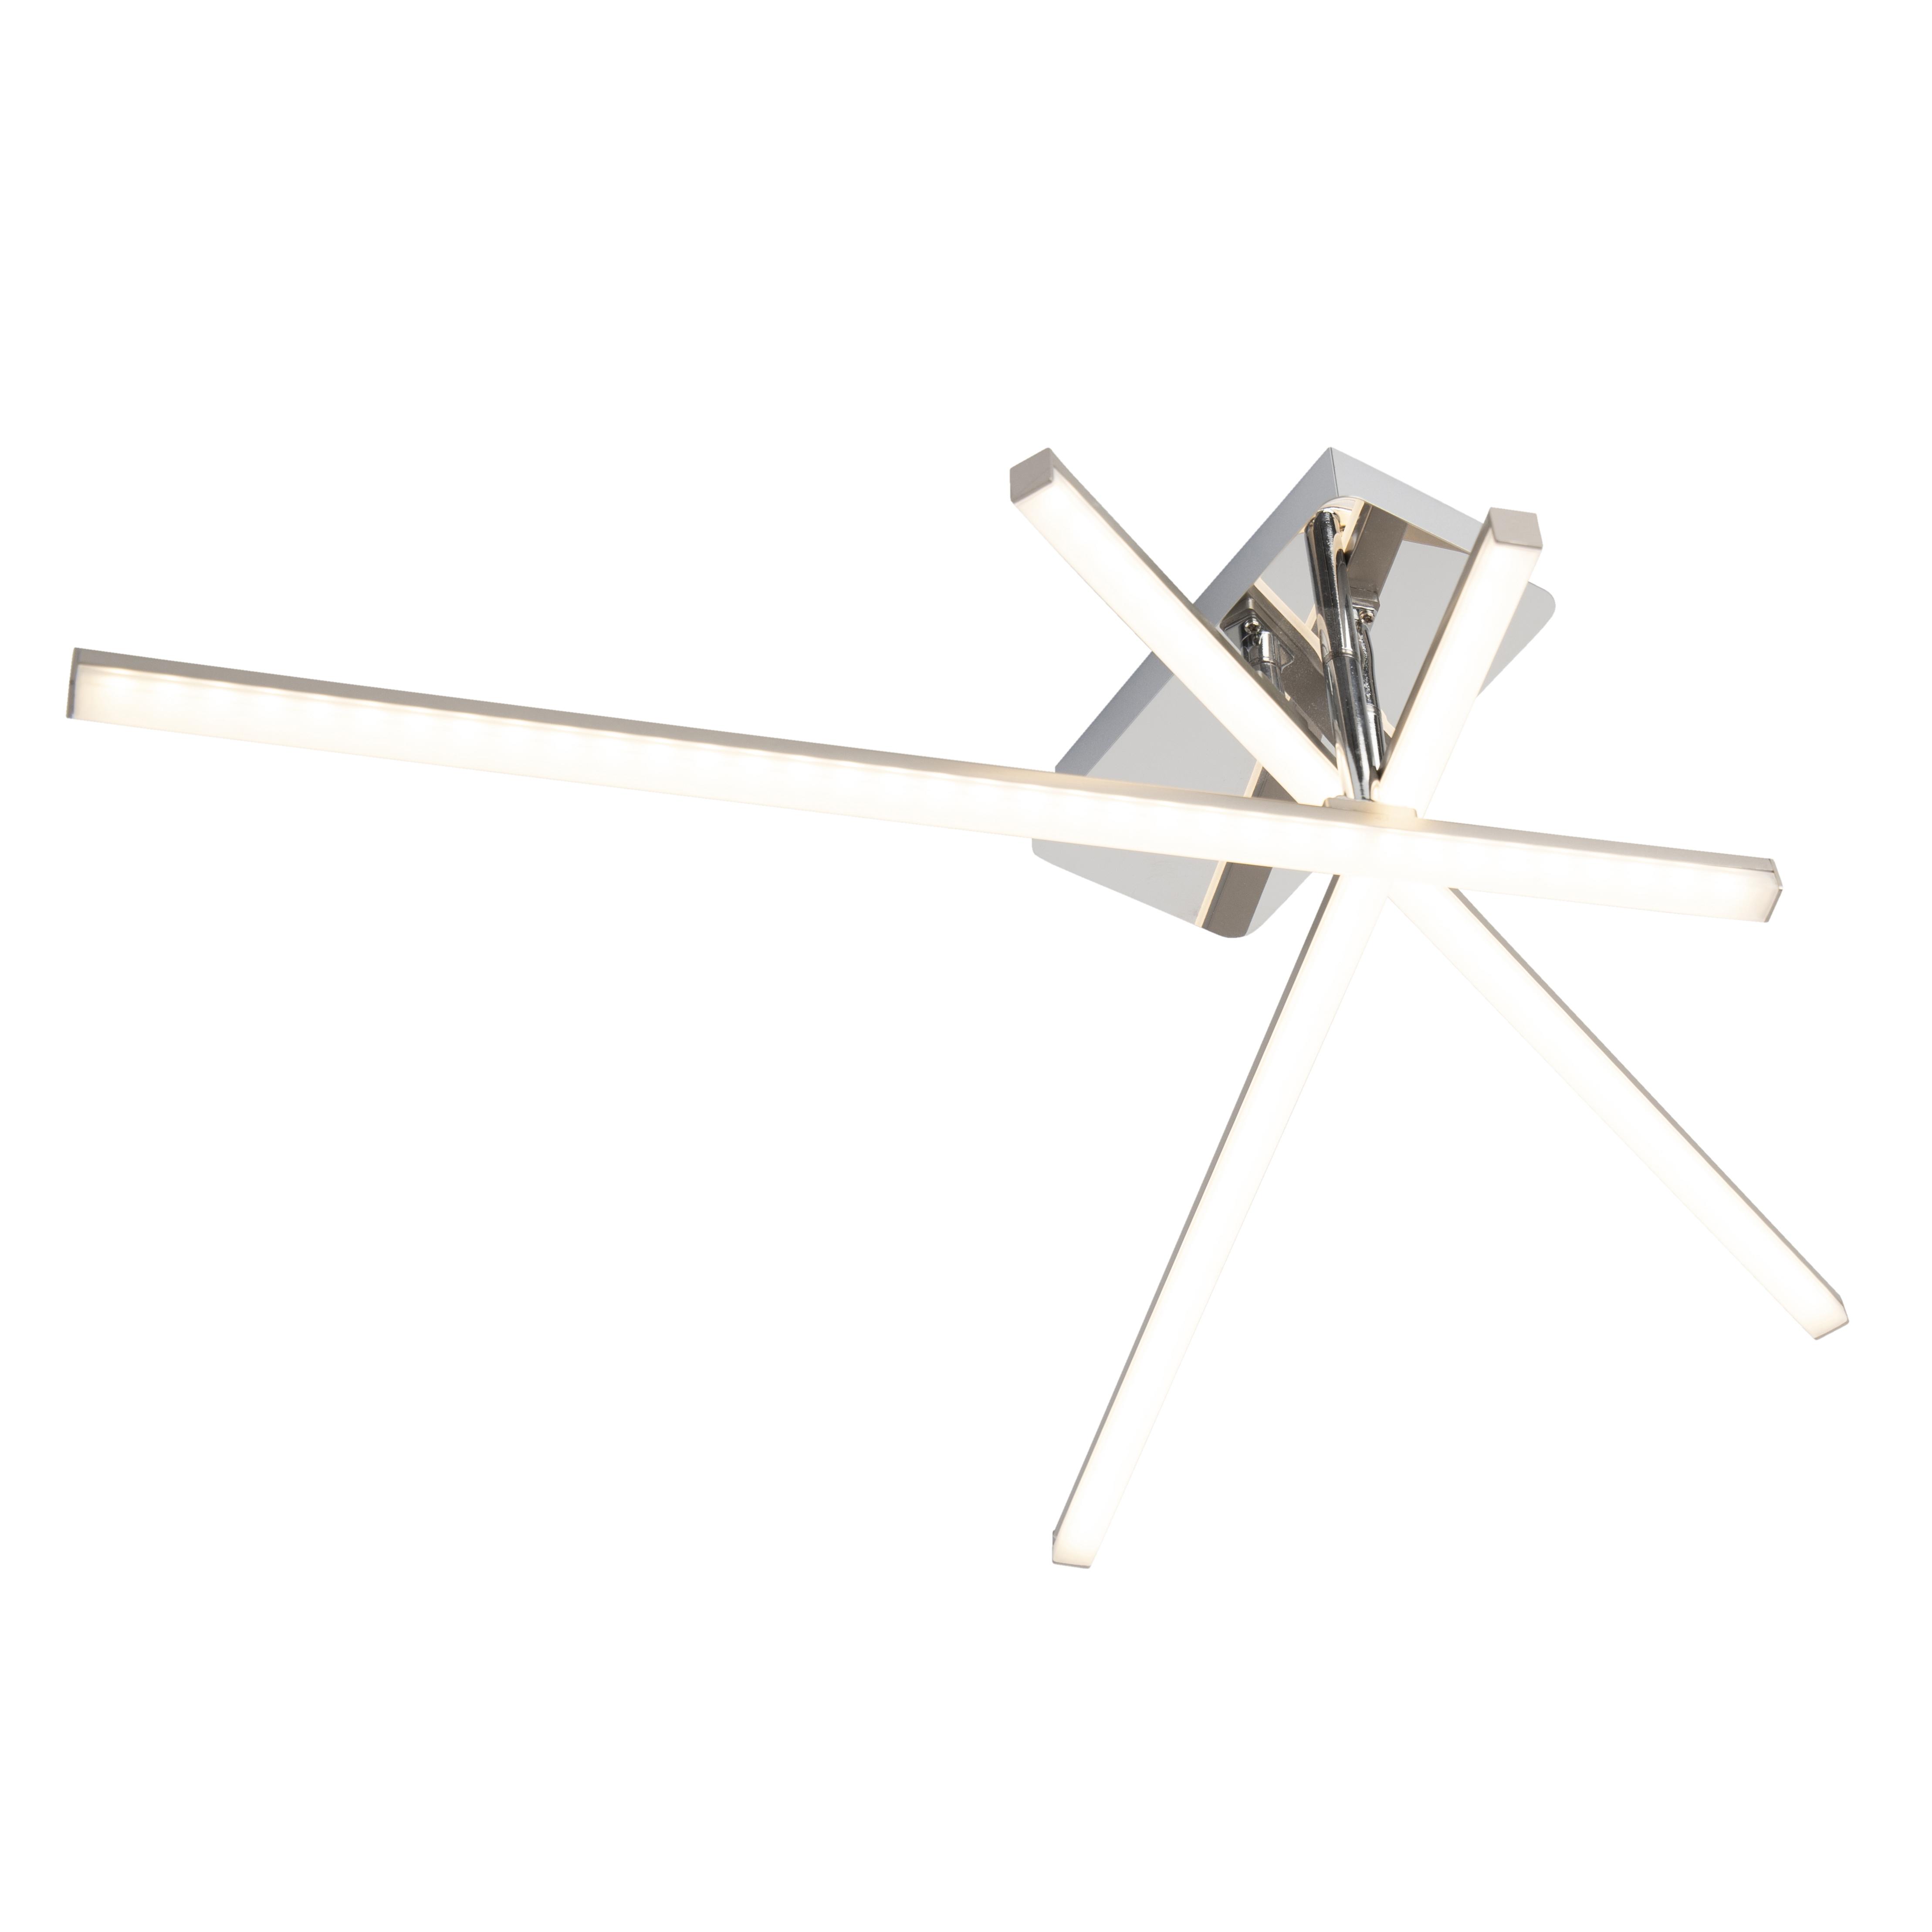 Design plafondlamp staal draaibare armen incl. LED - Simona tre